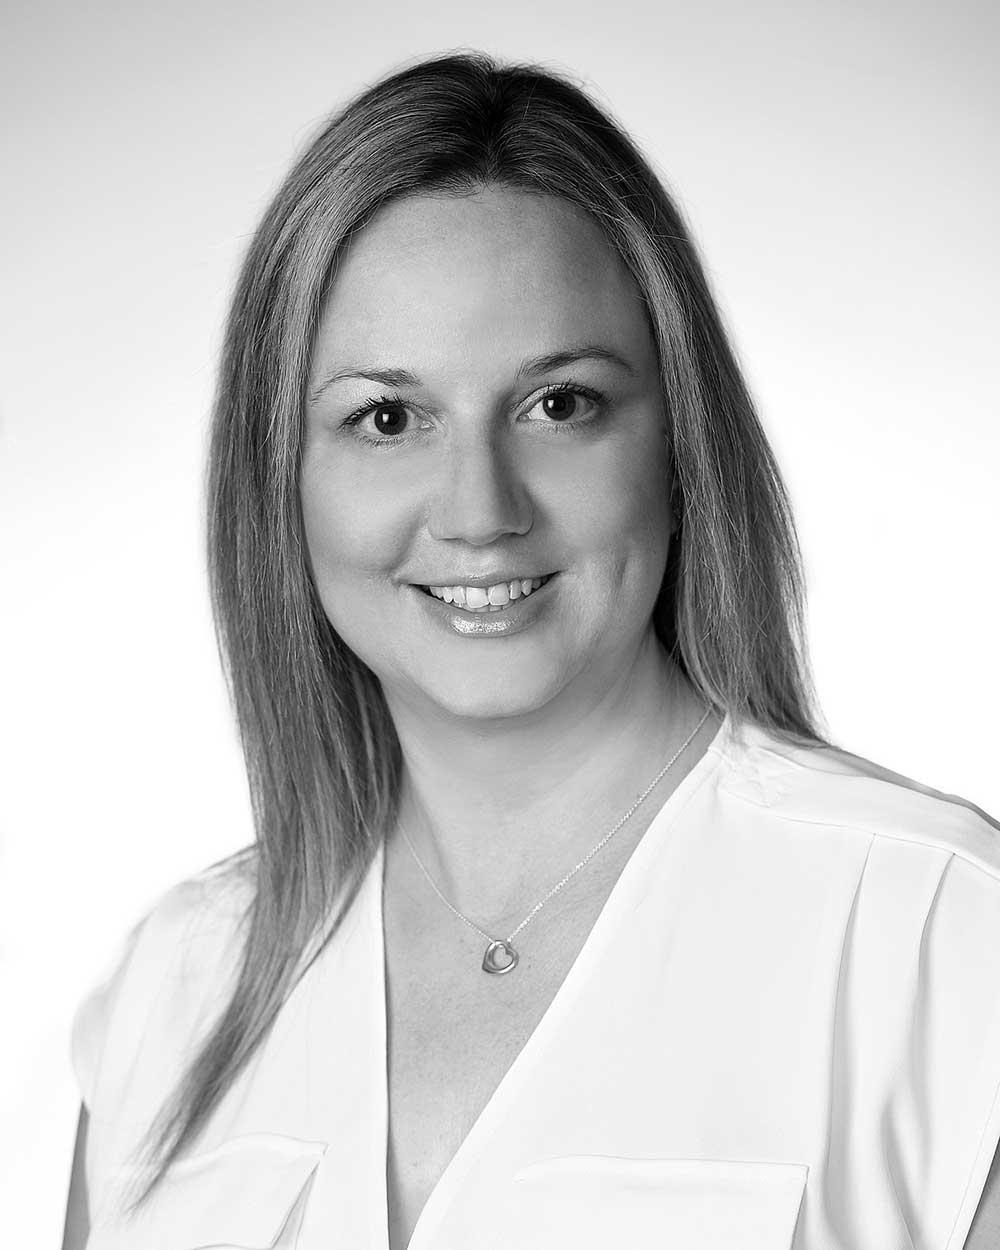 Megan Weikel